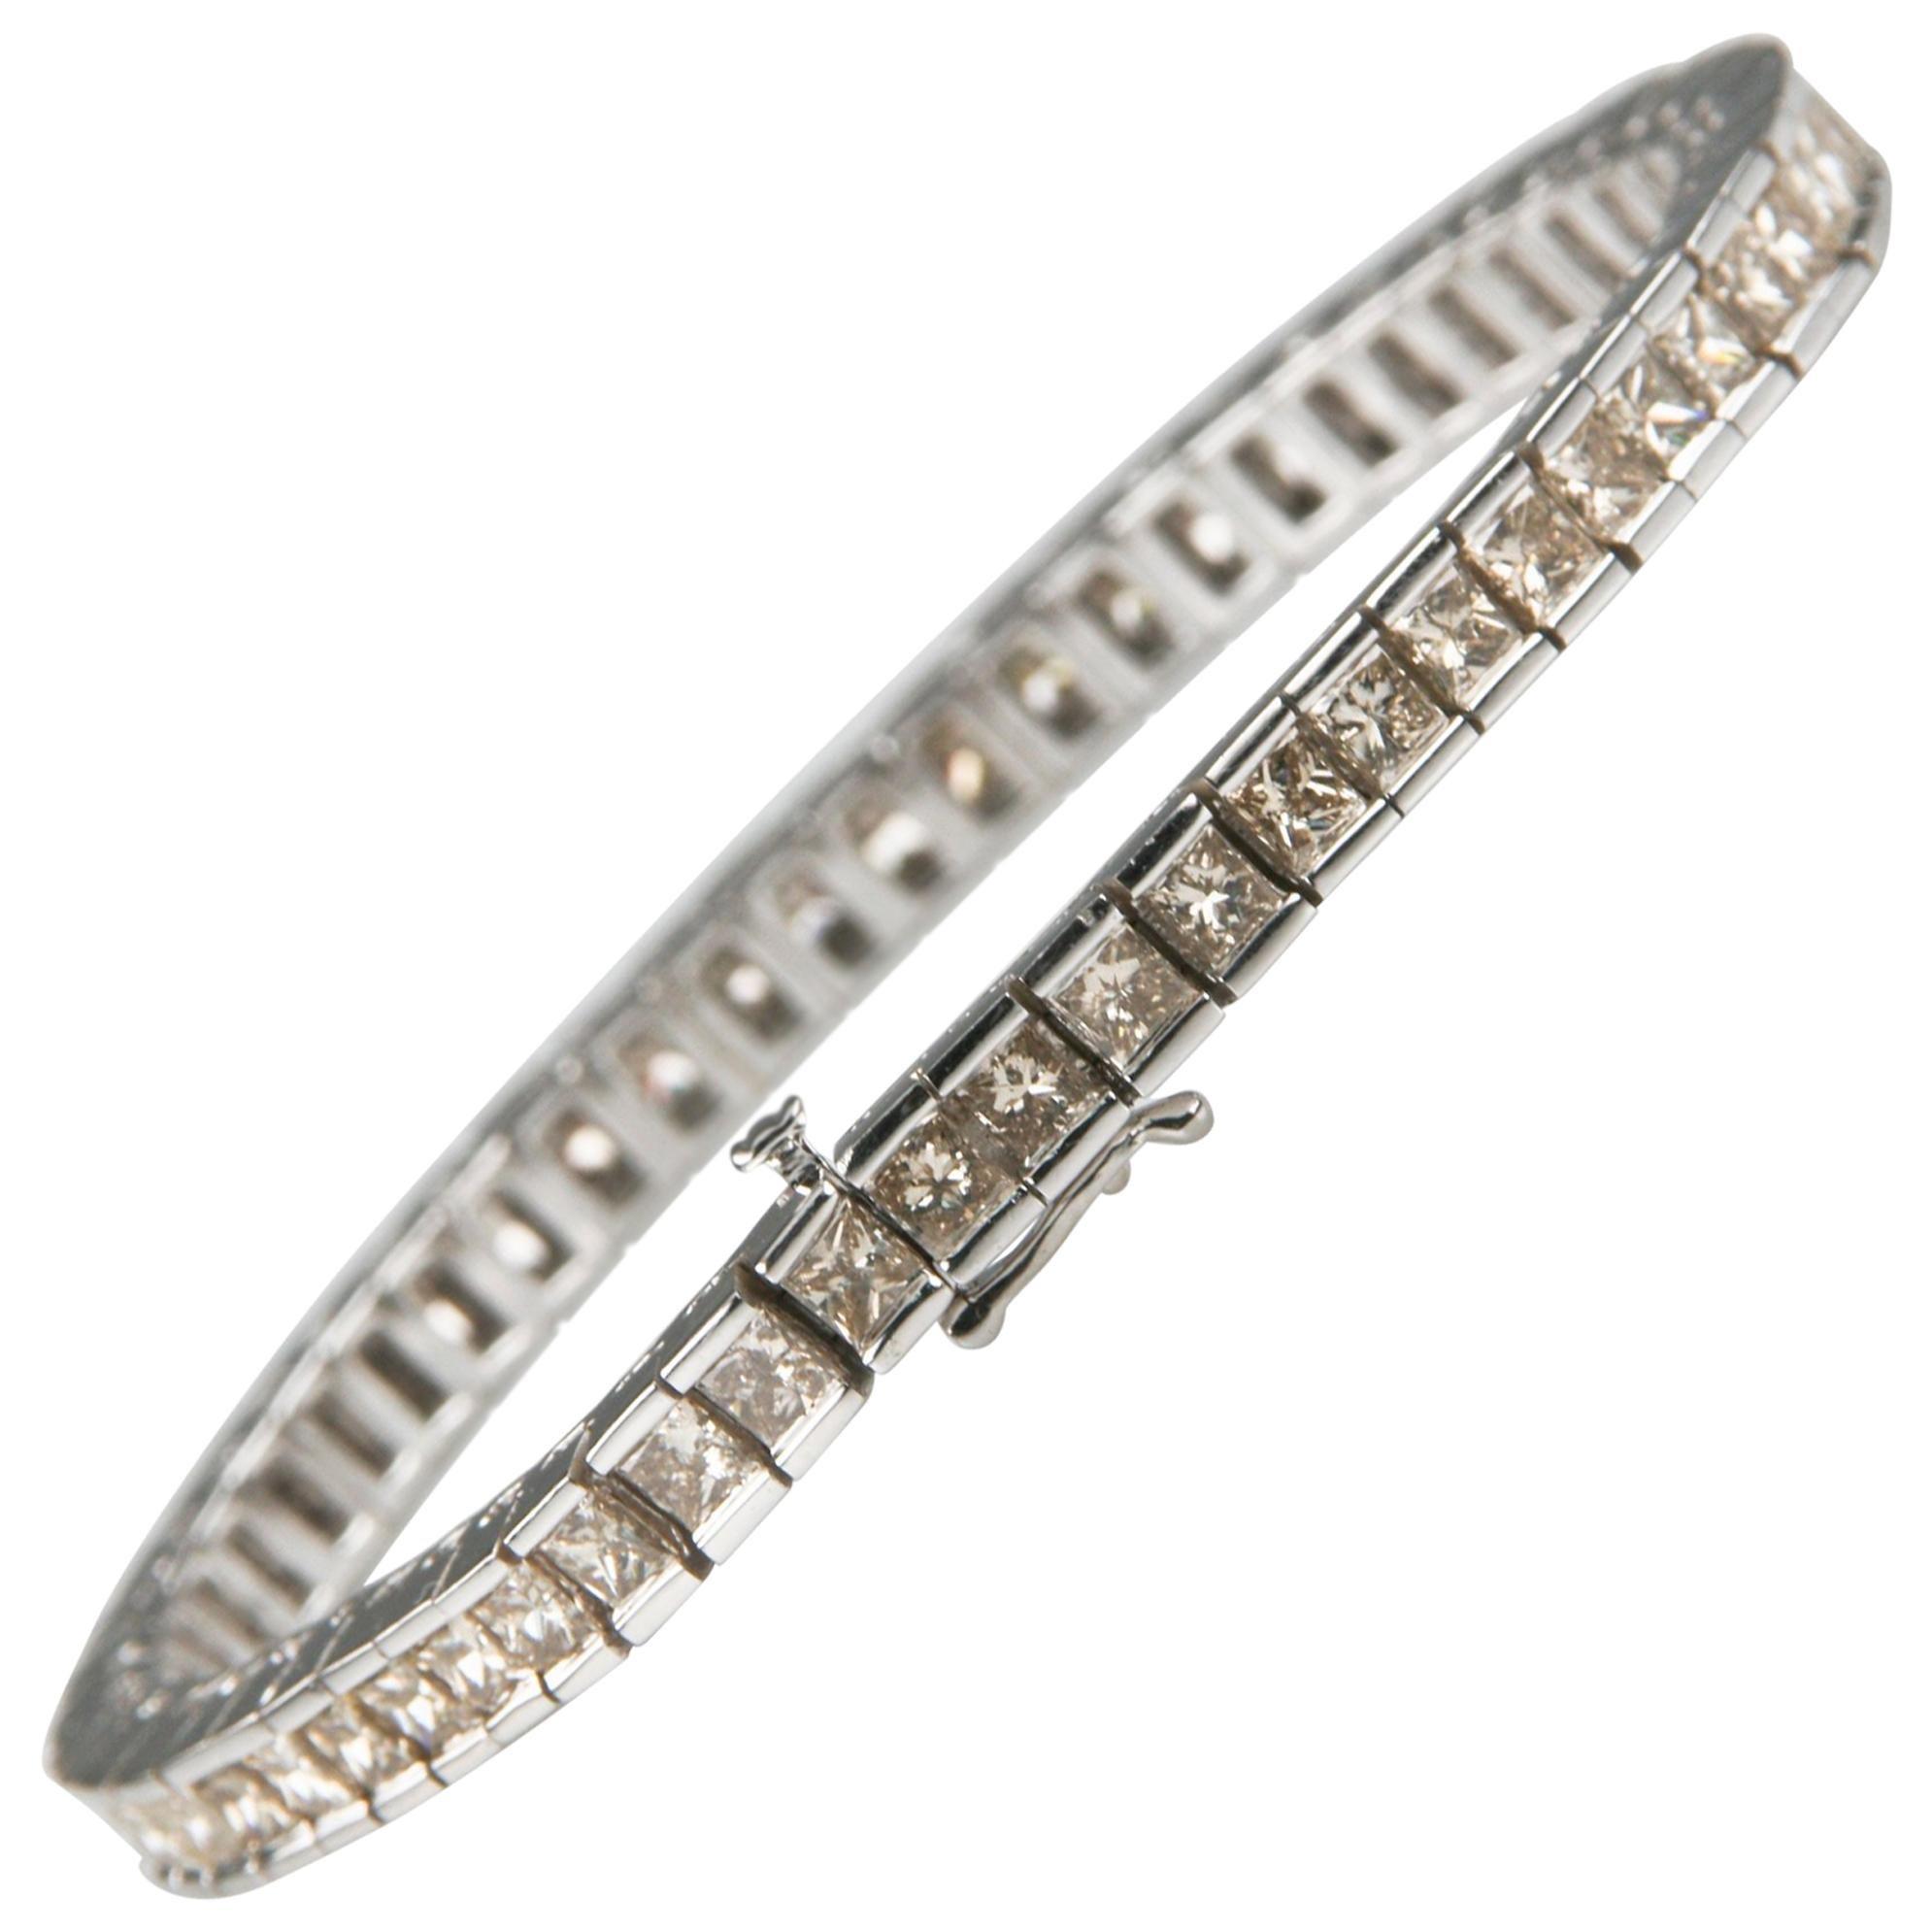 12.00 Carat Light Cognac Diamond 14 Karat White Gold Tennis Bracelet